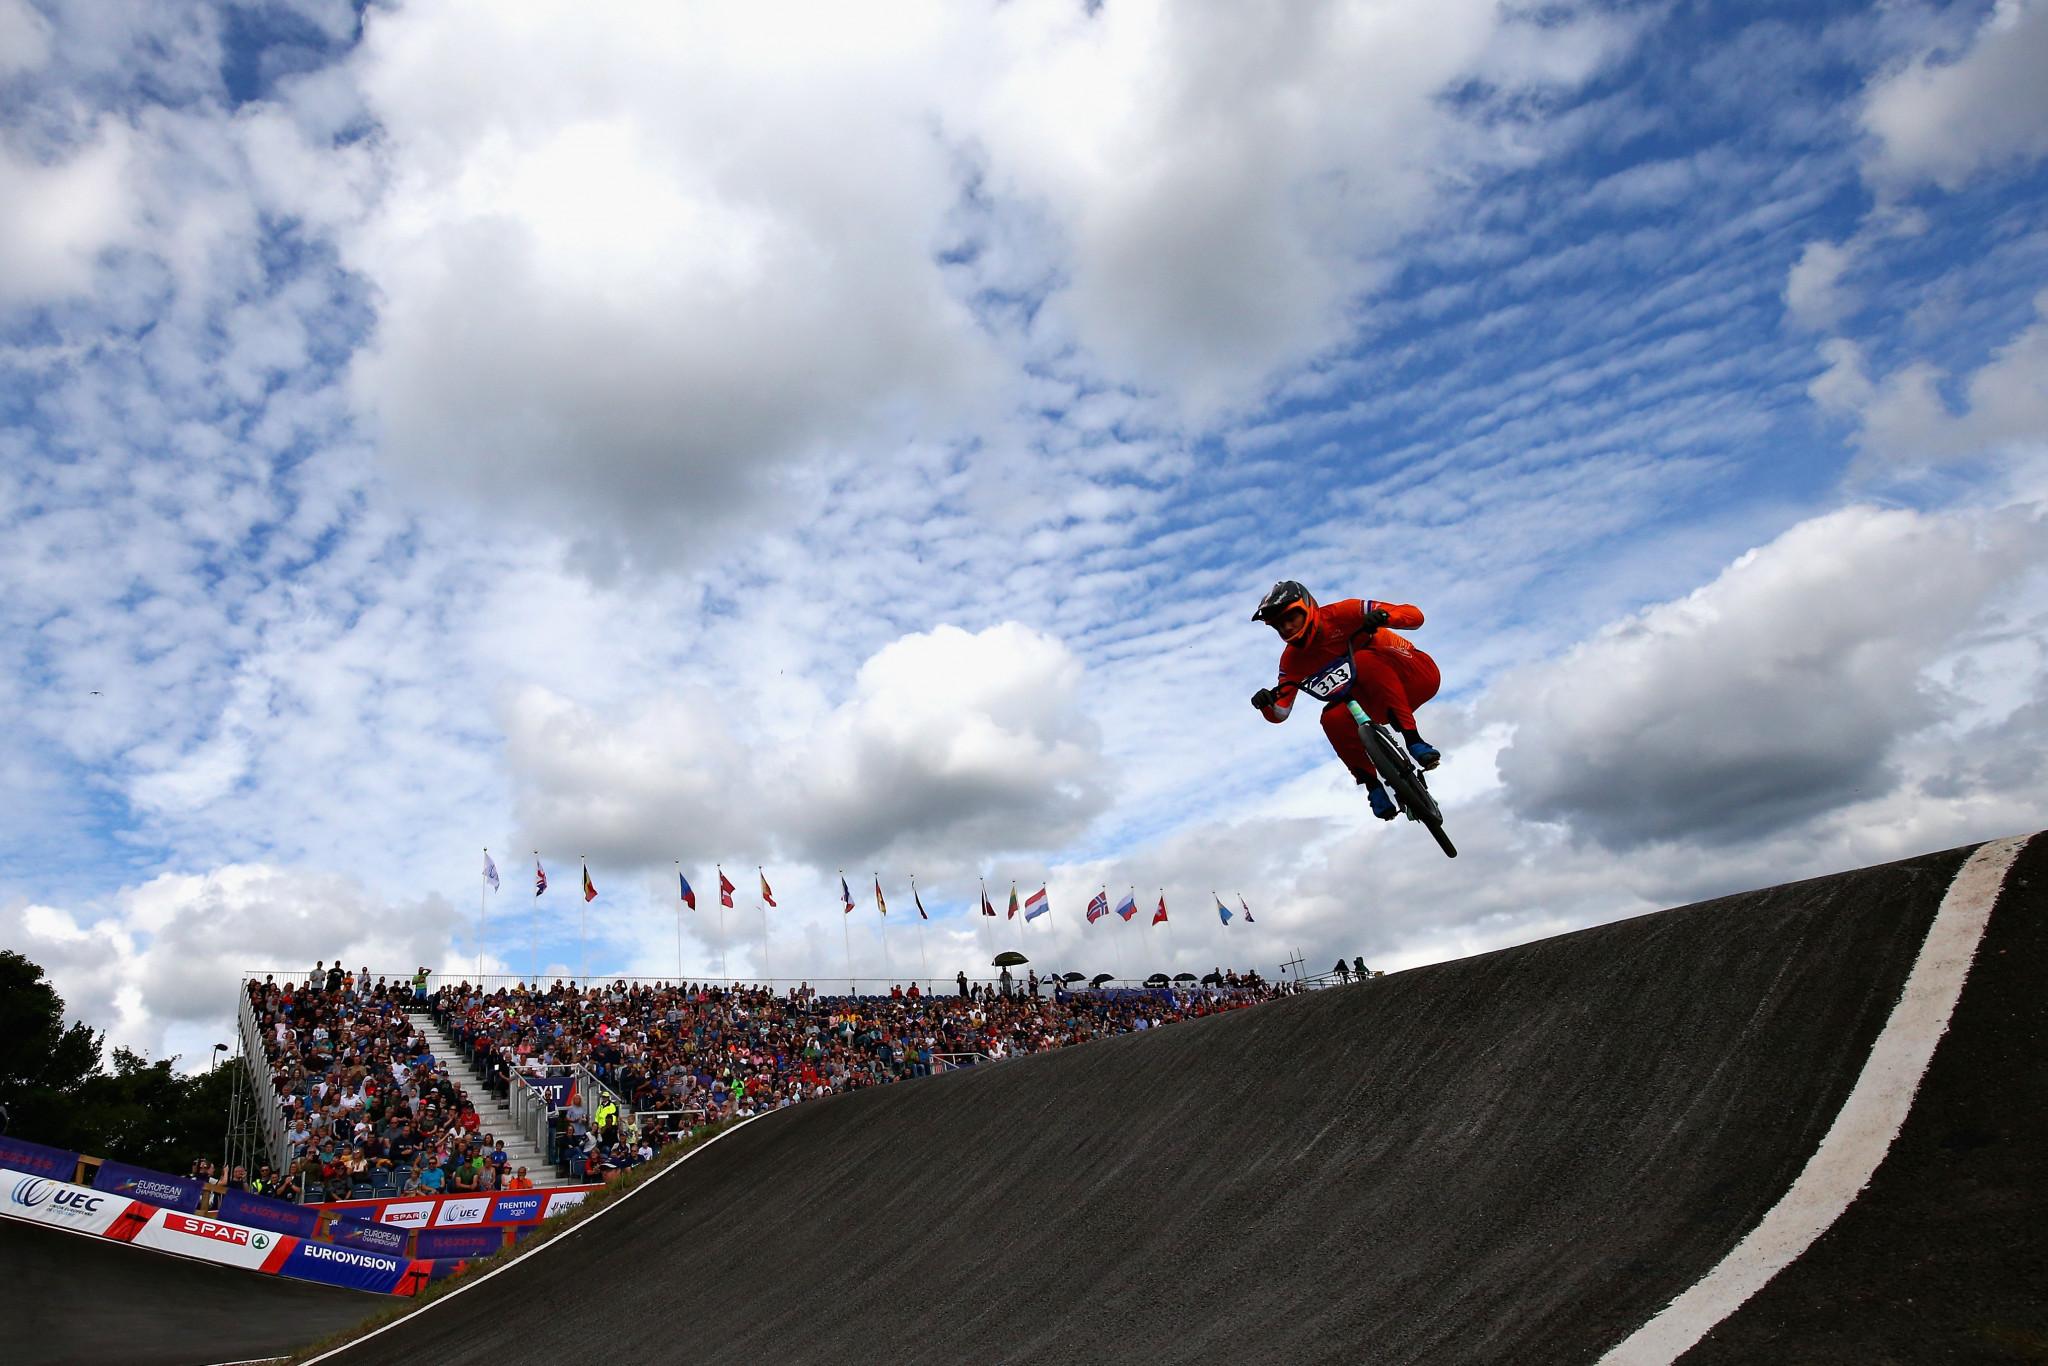 Dutchman Niek Kimmann triumphed in the men's elite race ©Getty Images